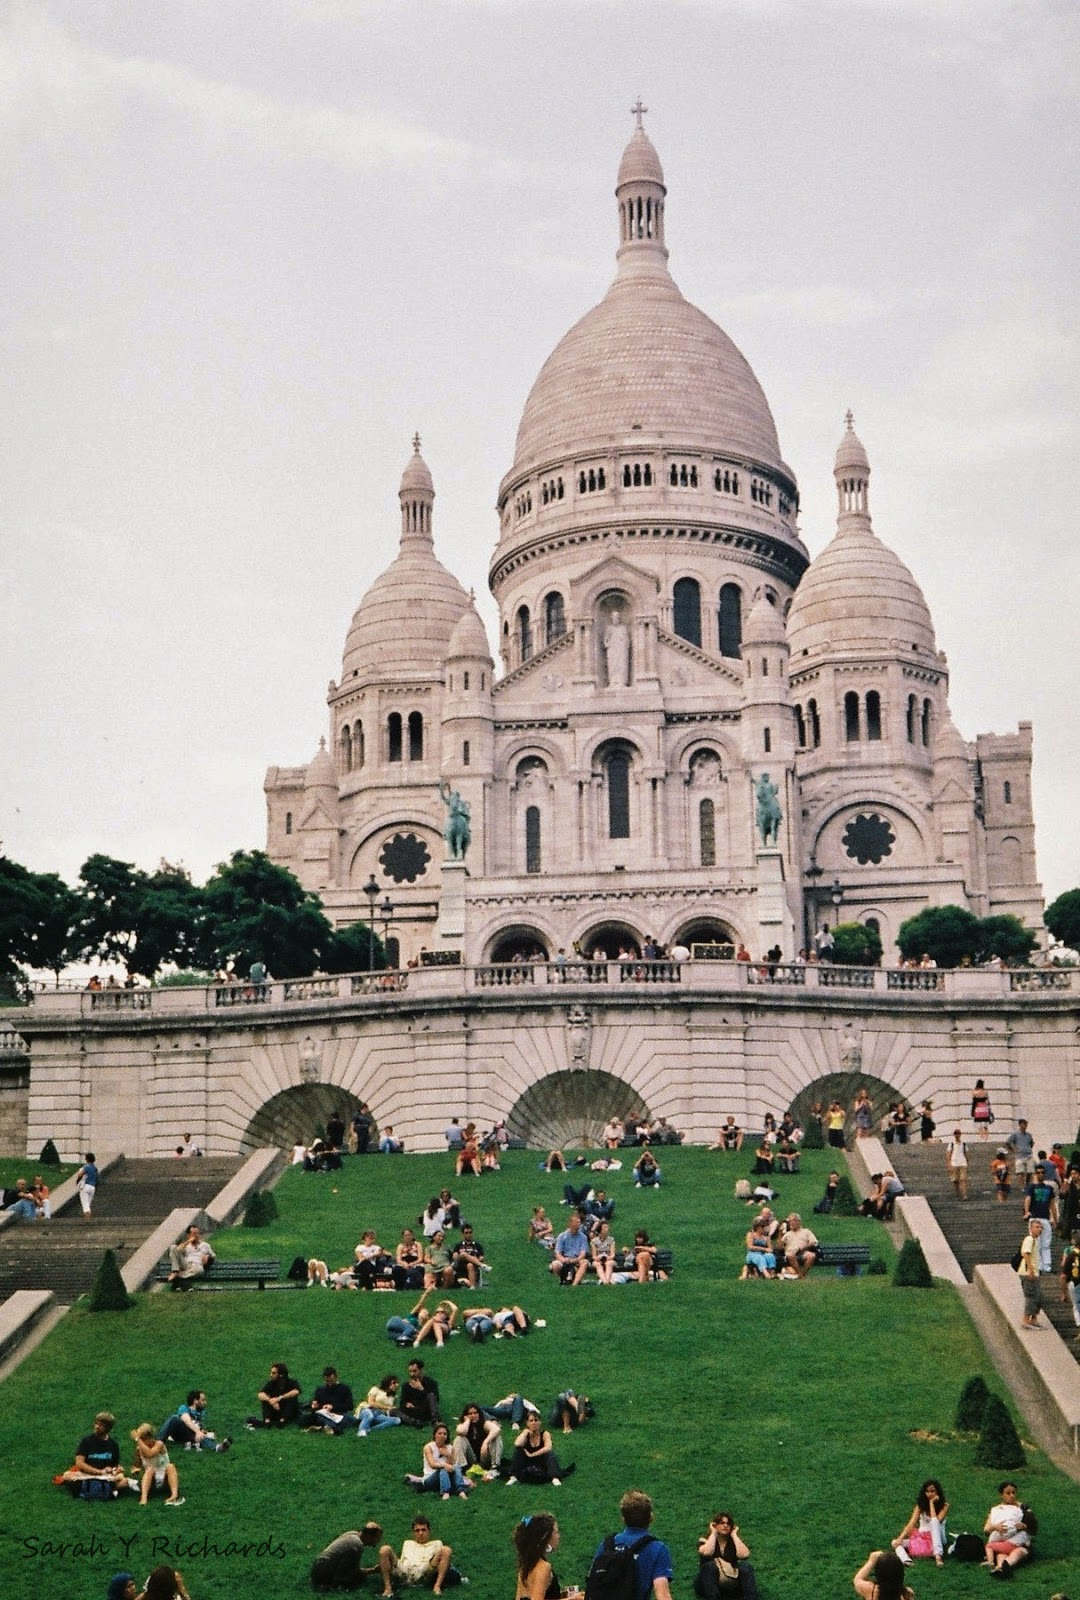 1. Notre Dame